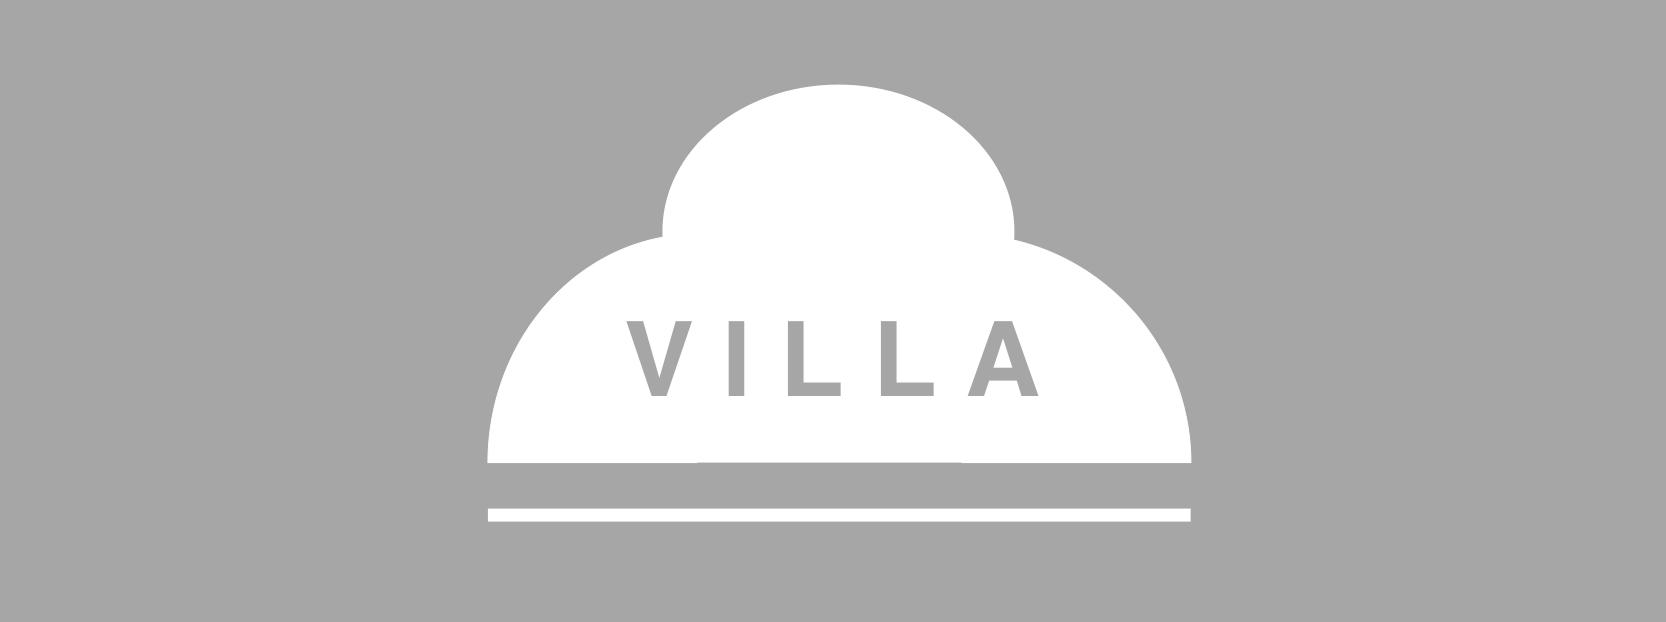 Villa Pilvi